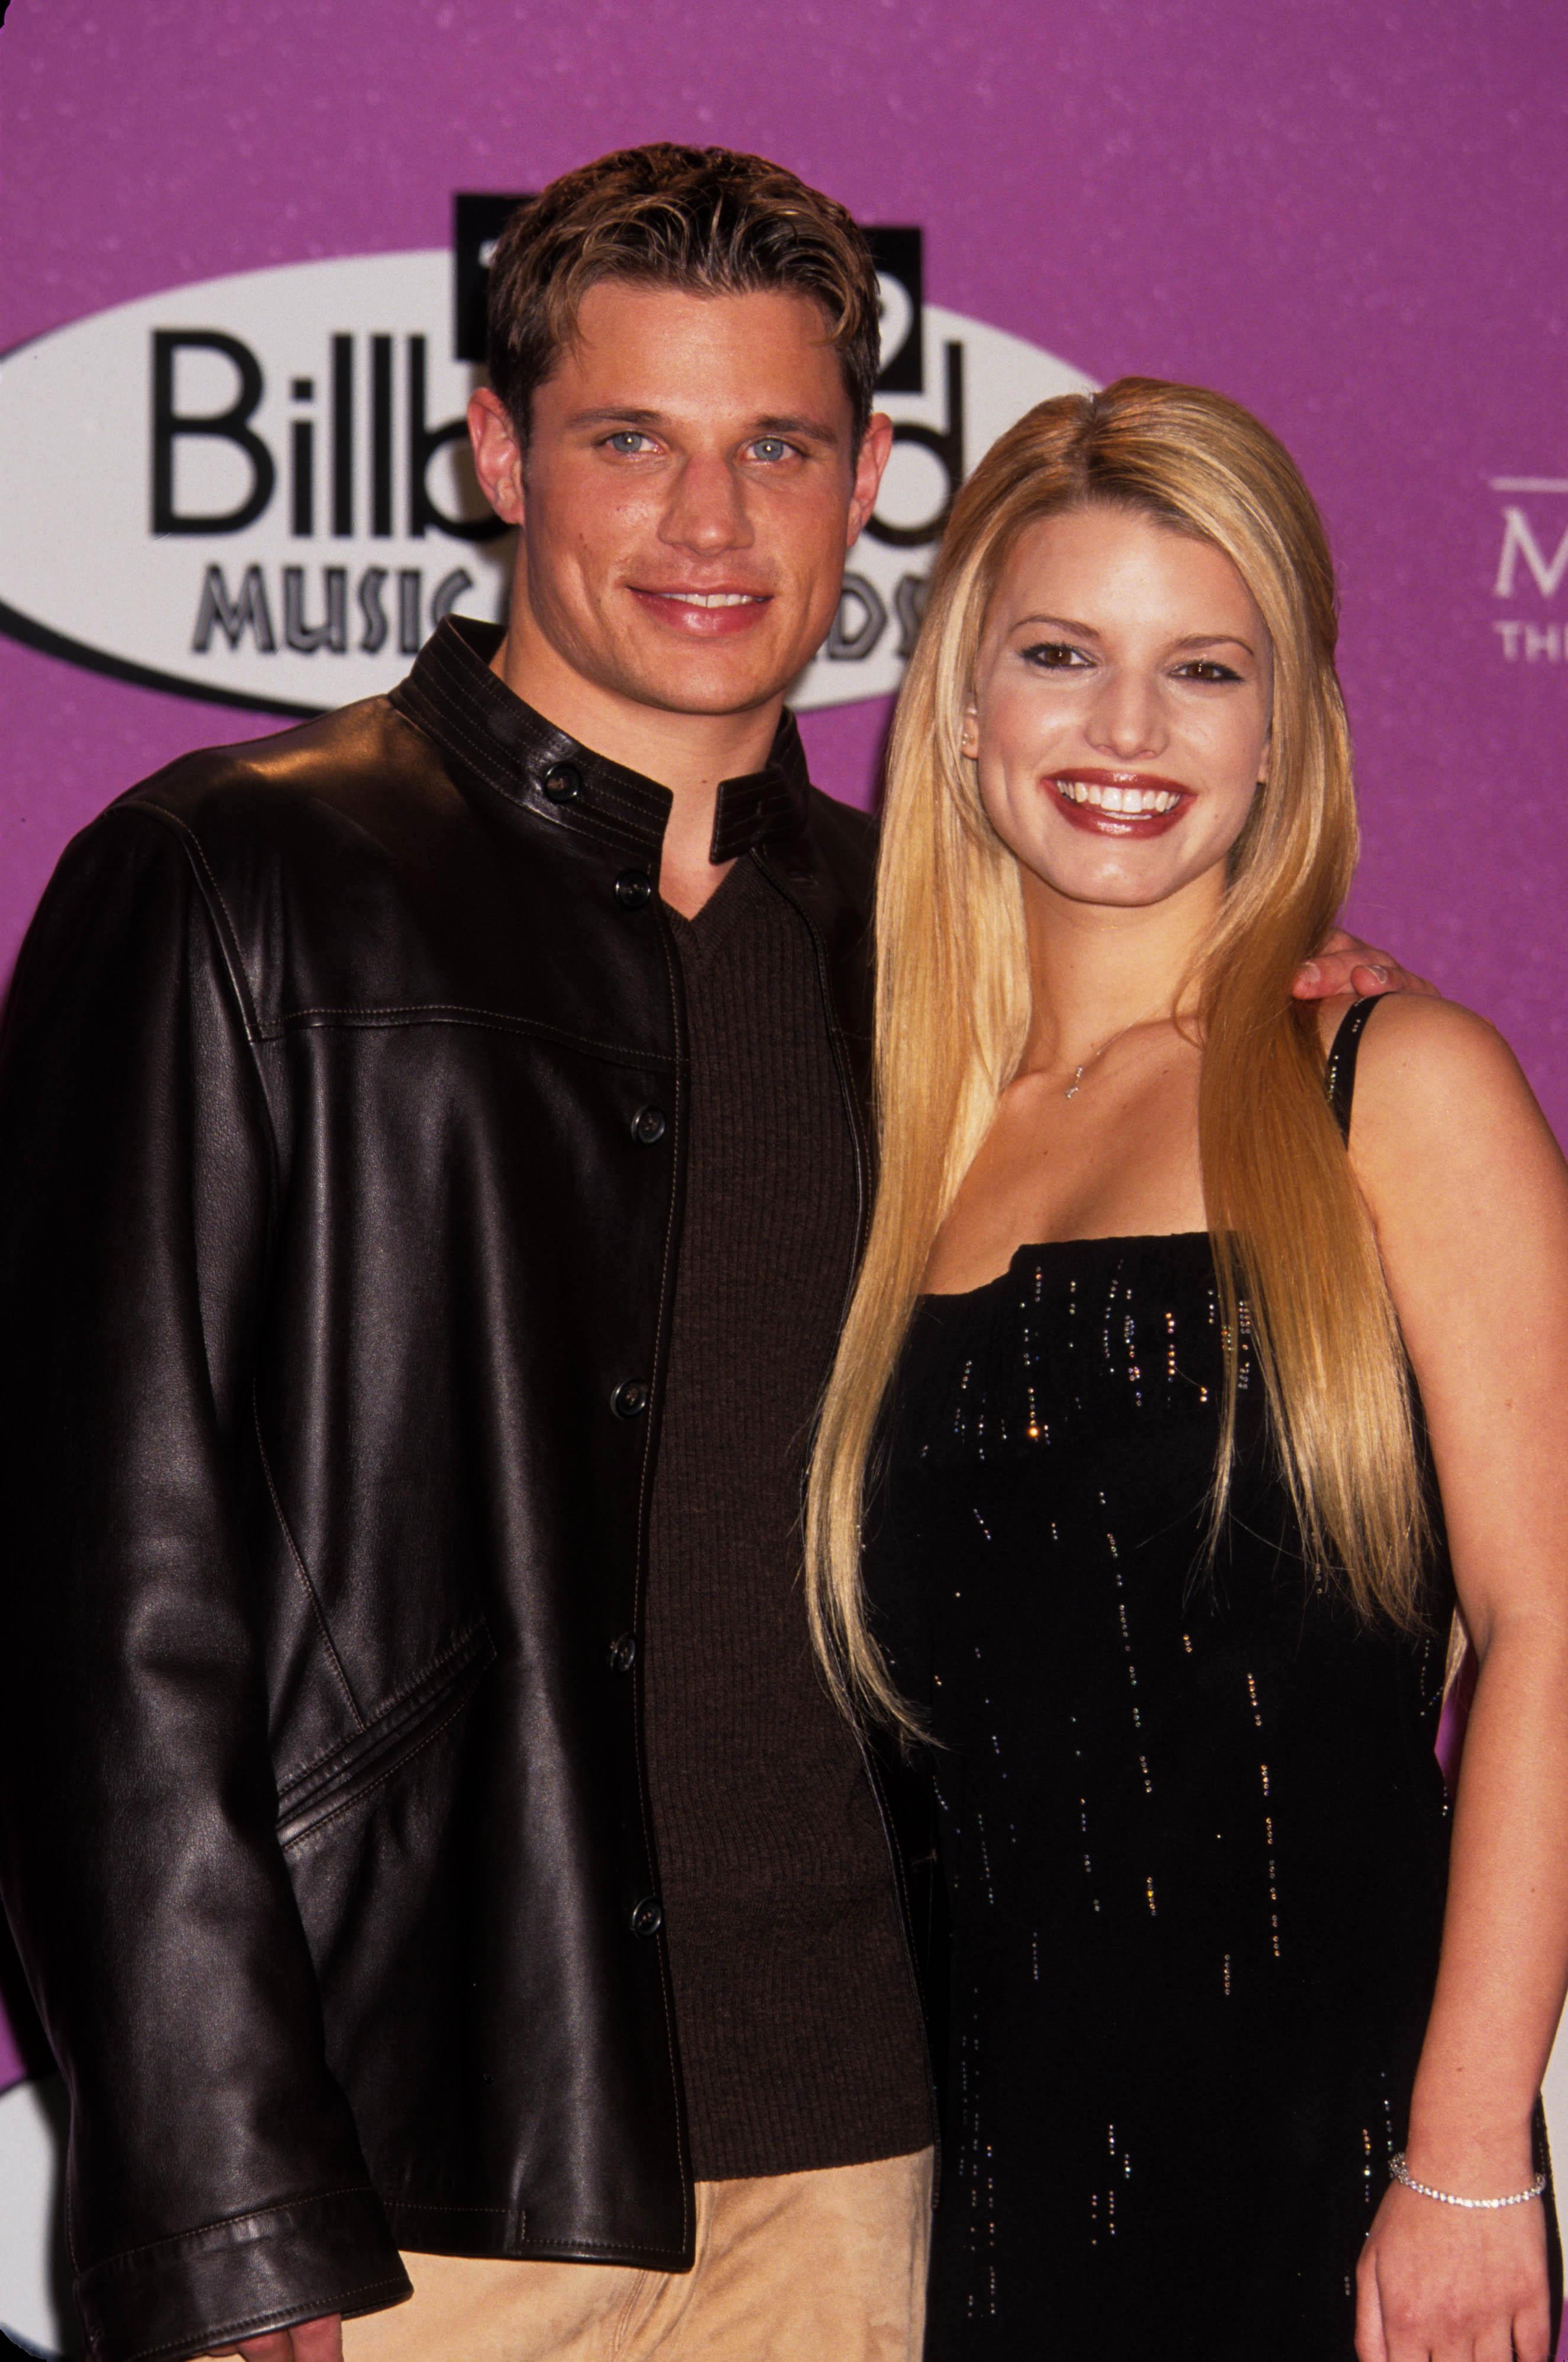 Jessica Simpson, Nick Lachey, Billboard Music Awards